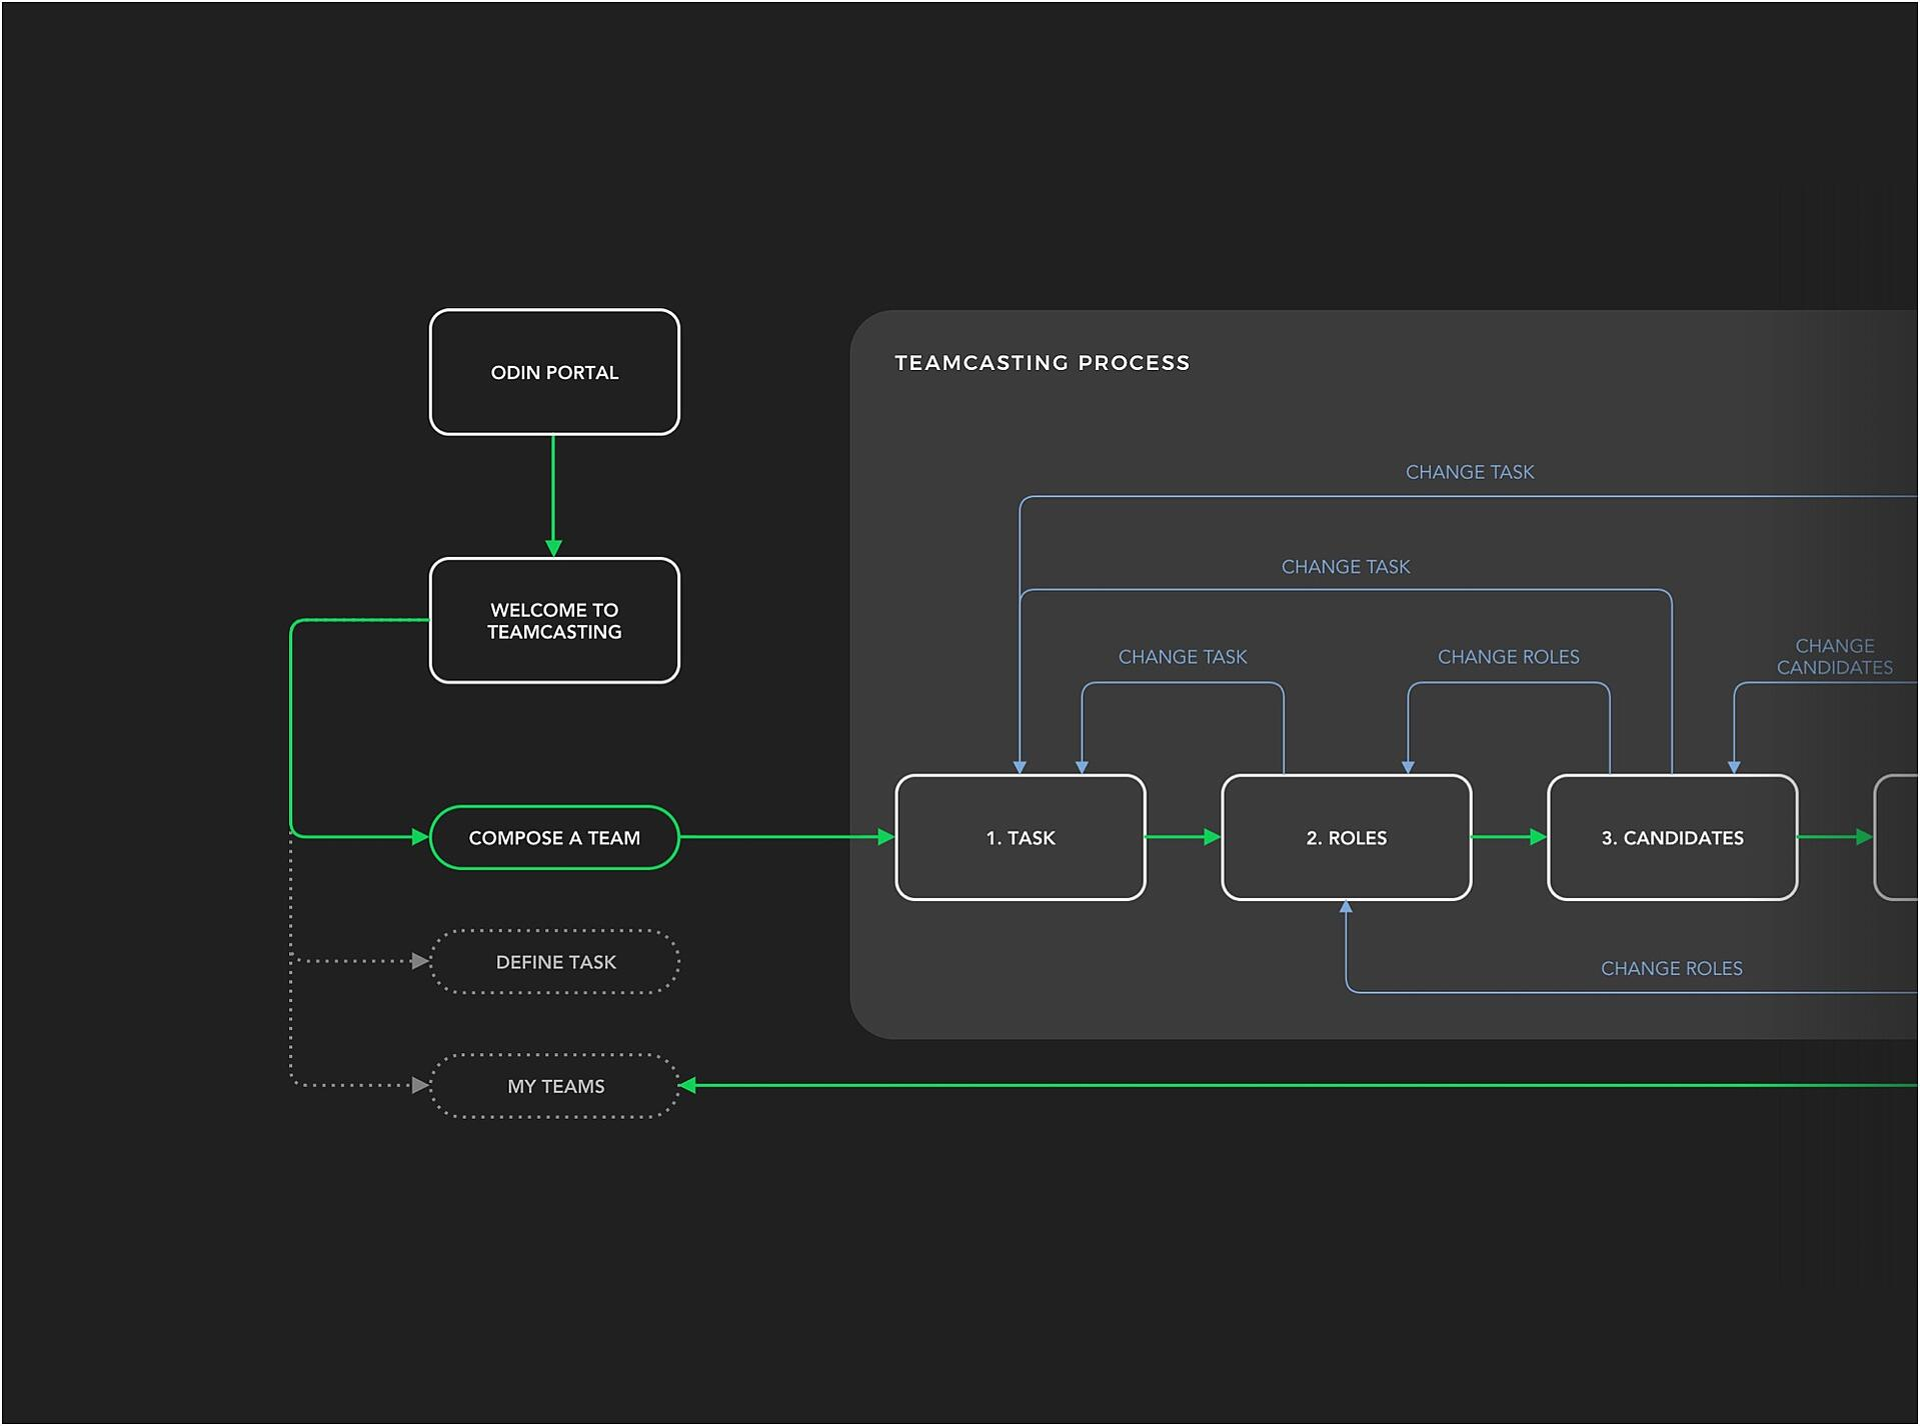 teamcasting process diagram